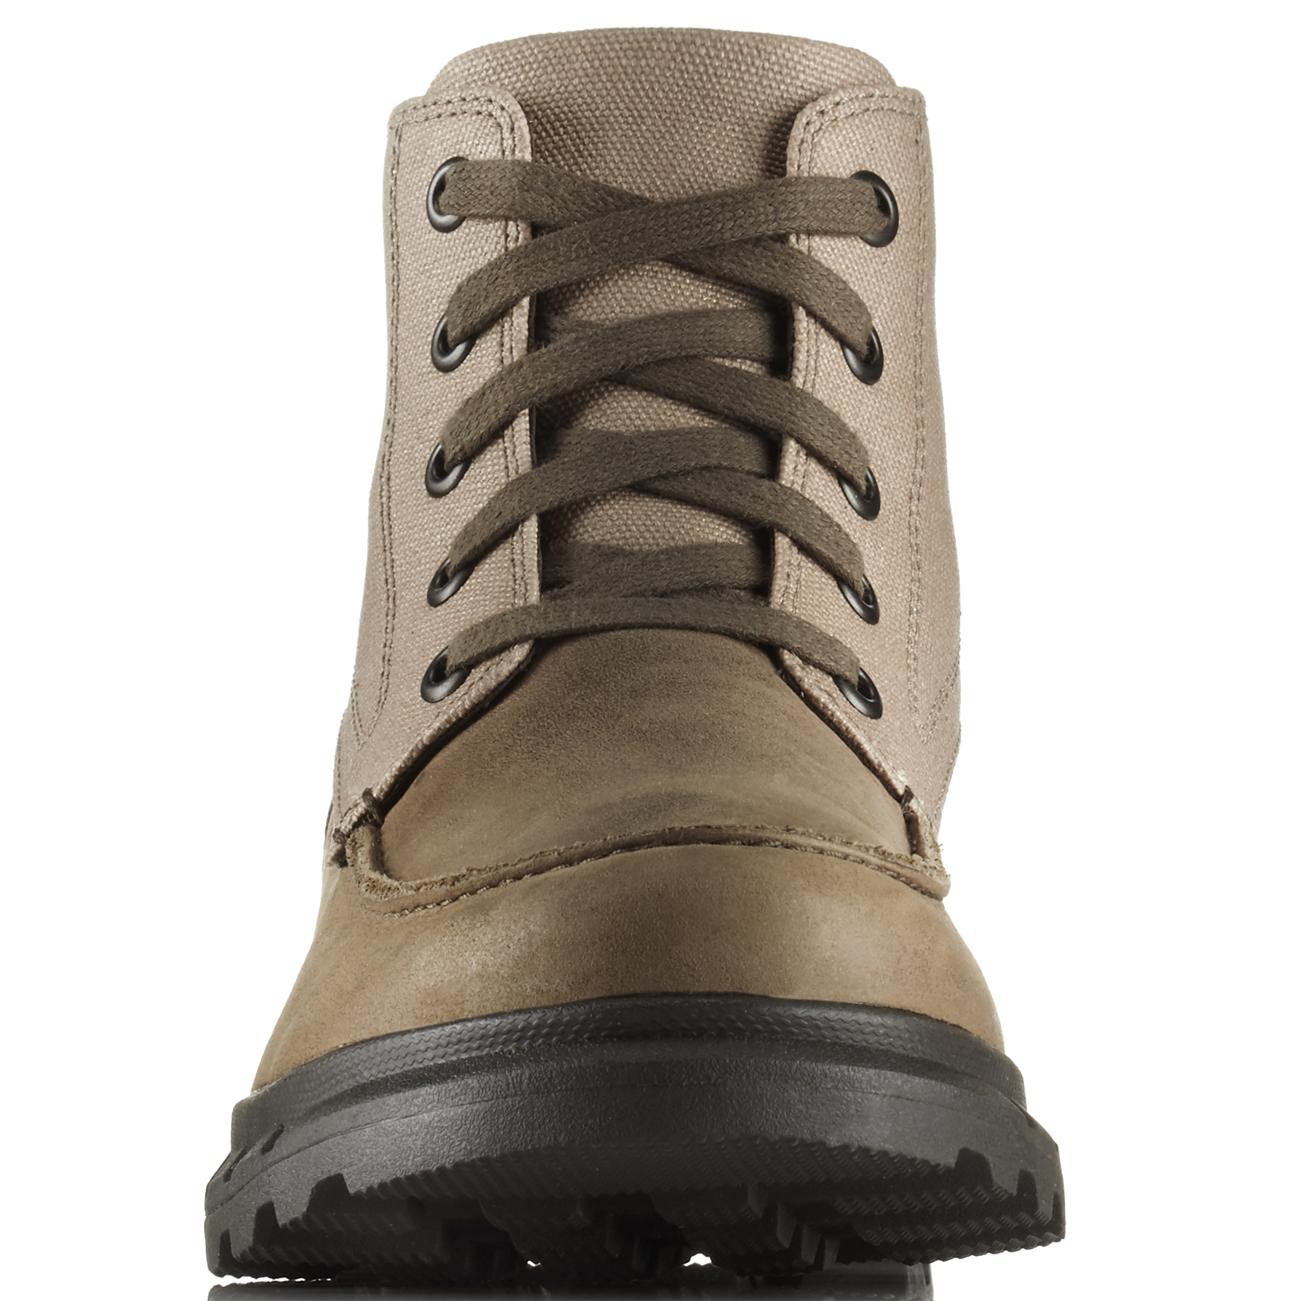 Mens Sorel Portzman Moc Toe Snow Snow Snow Walking Trekking Mountain Ankle Stiefel All Größes 66ef2c